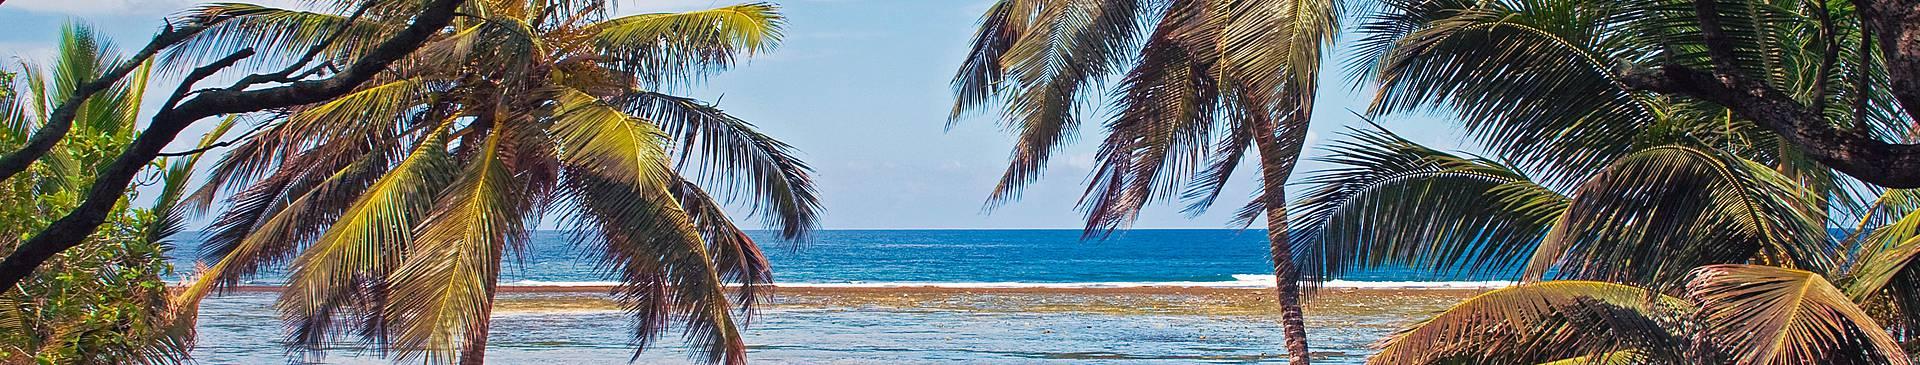 Voyage plage au Kenya